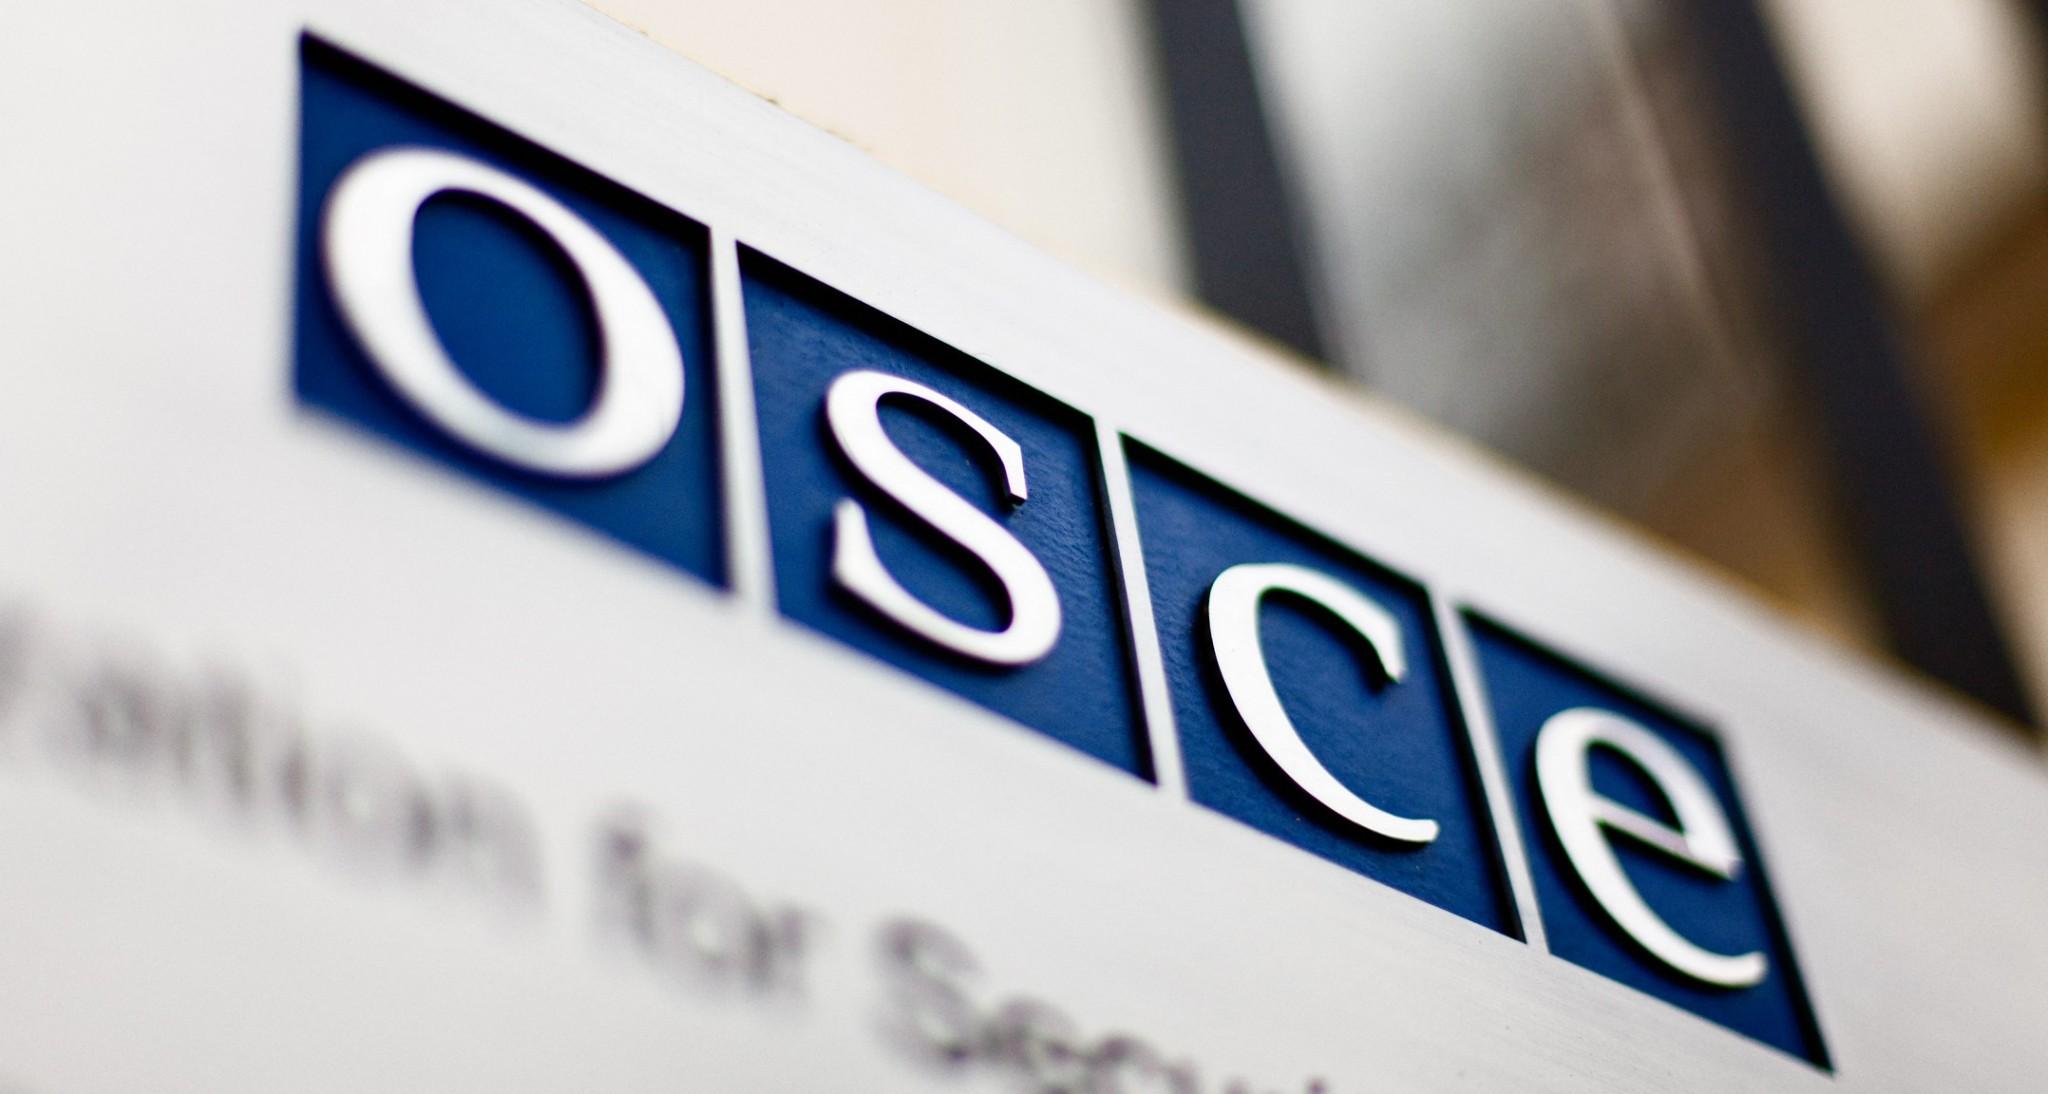 OSCE-Retina-1024x547@2x